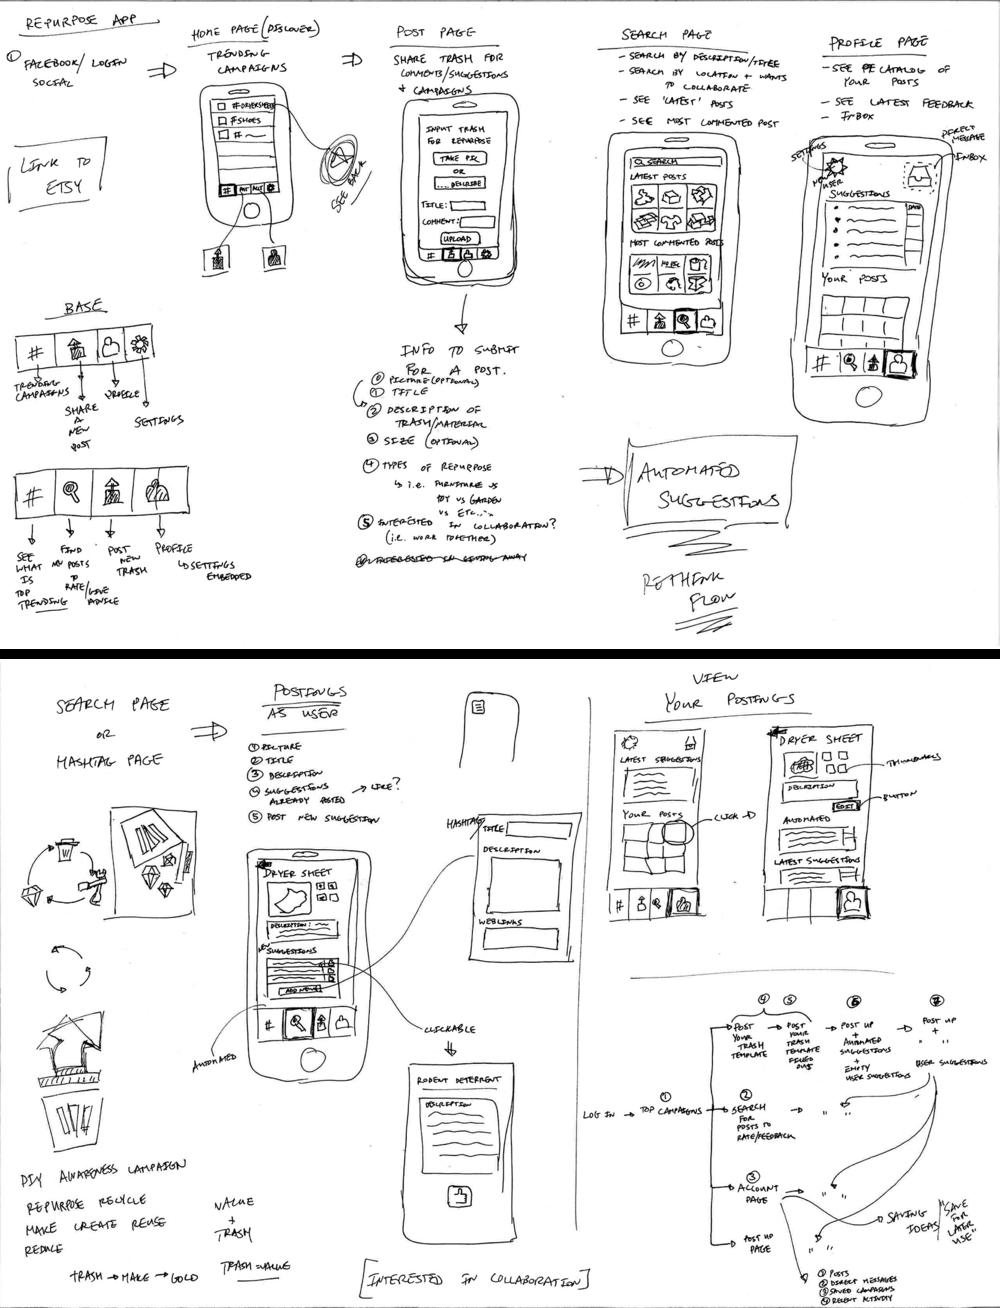 App Sketch.png